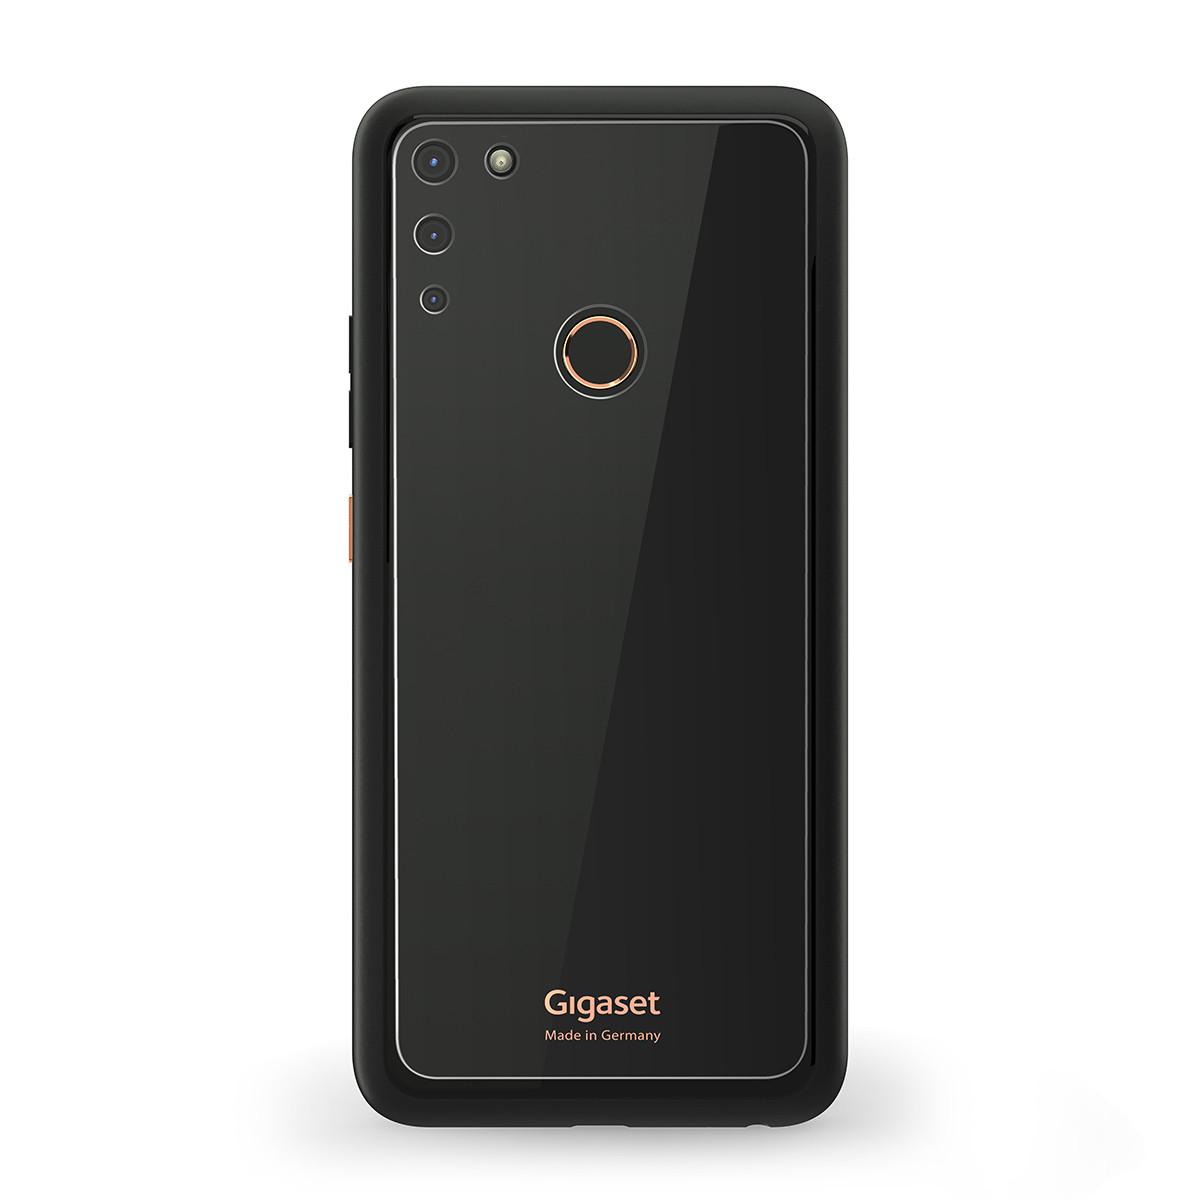 Gigaset Crystalclear Backside Protector (GS4)